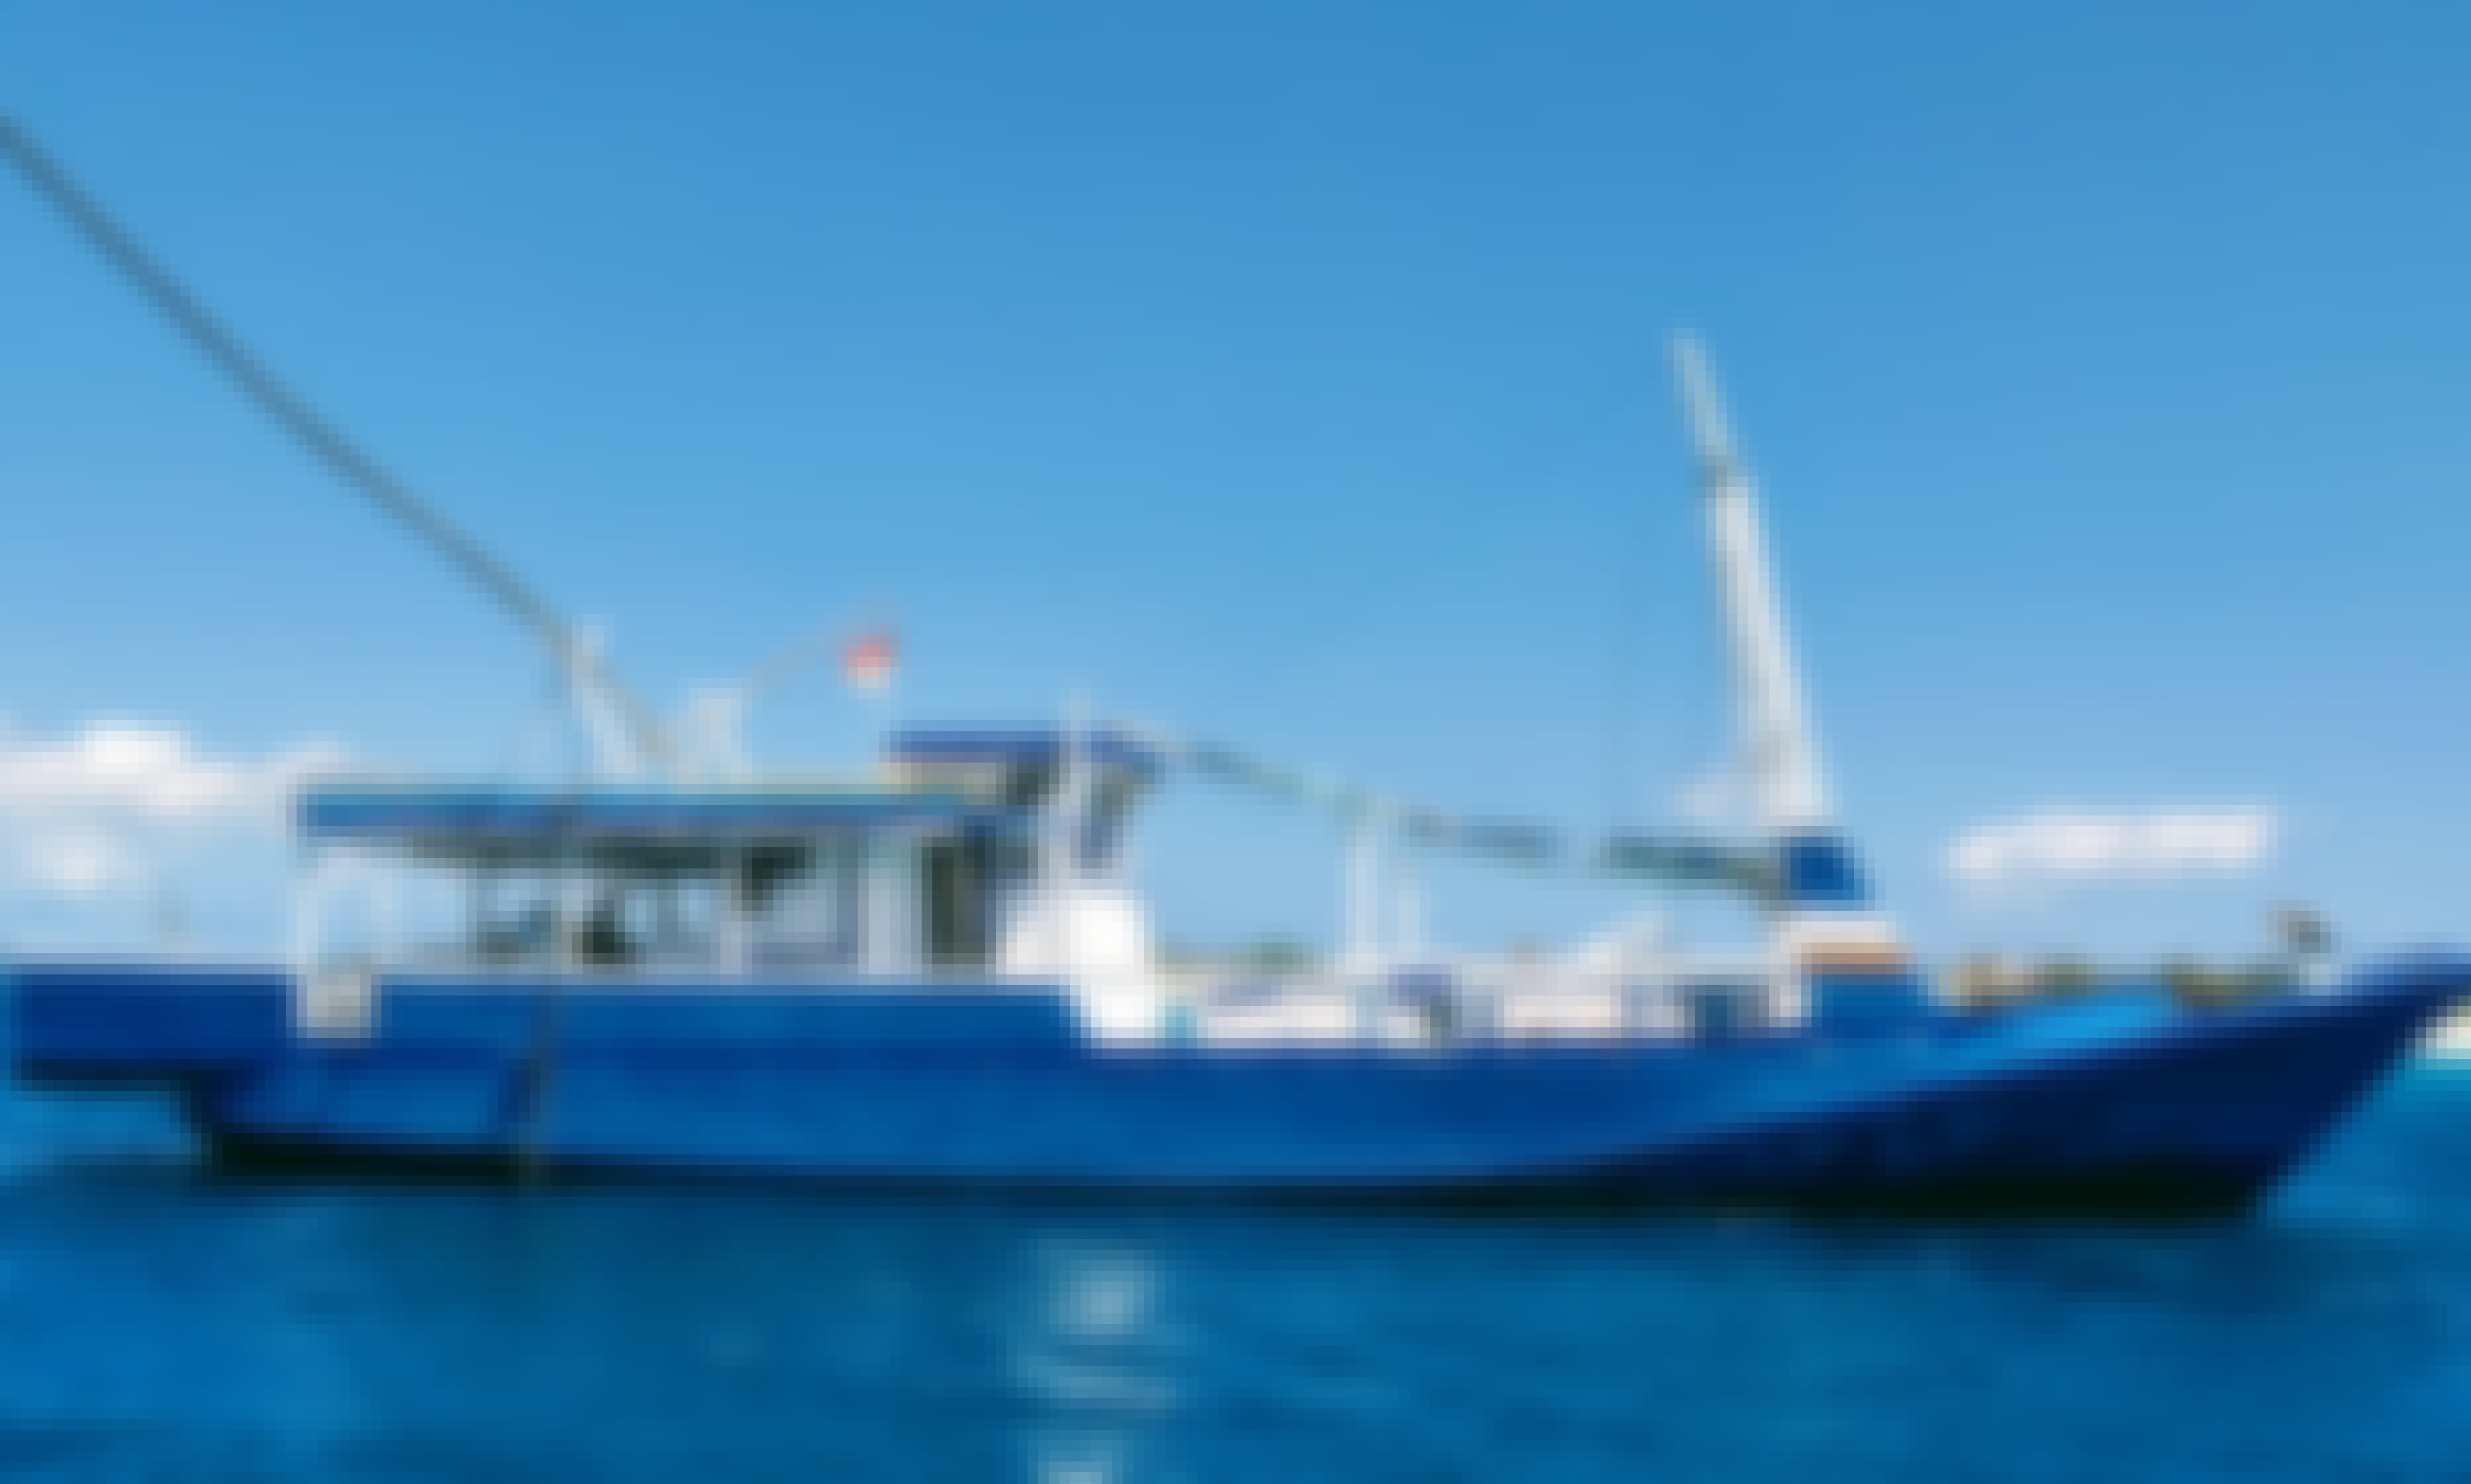 Fishing Boat for 6 People in Rote Barat, Nusa Tenggara Timur